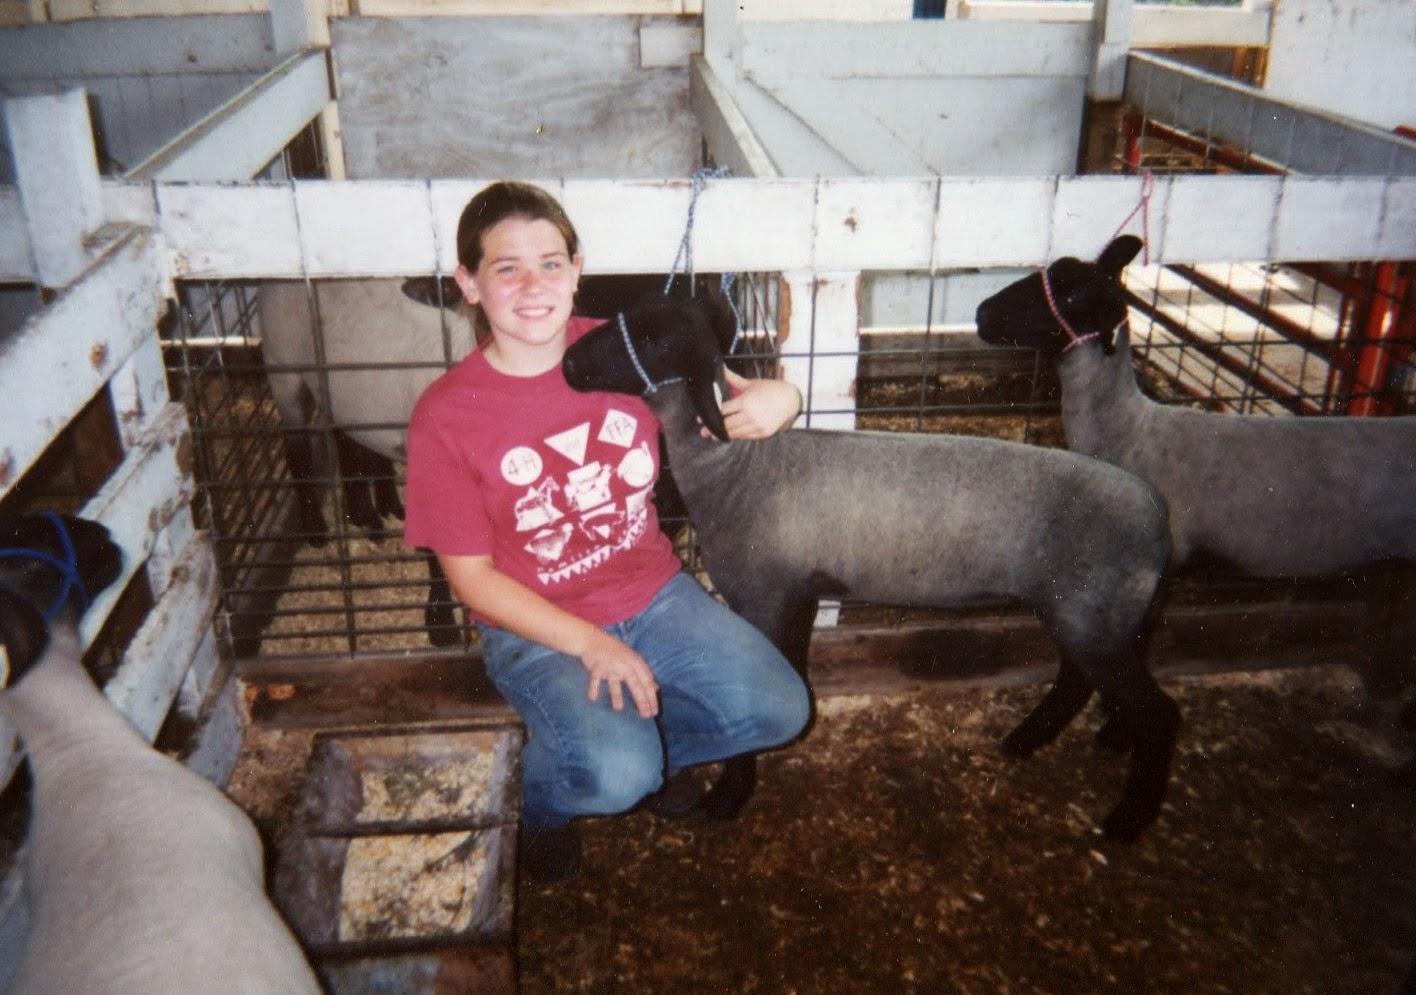 Showing lambs through FFA at the County Fair